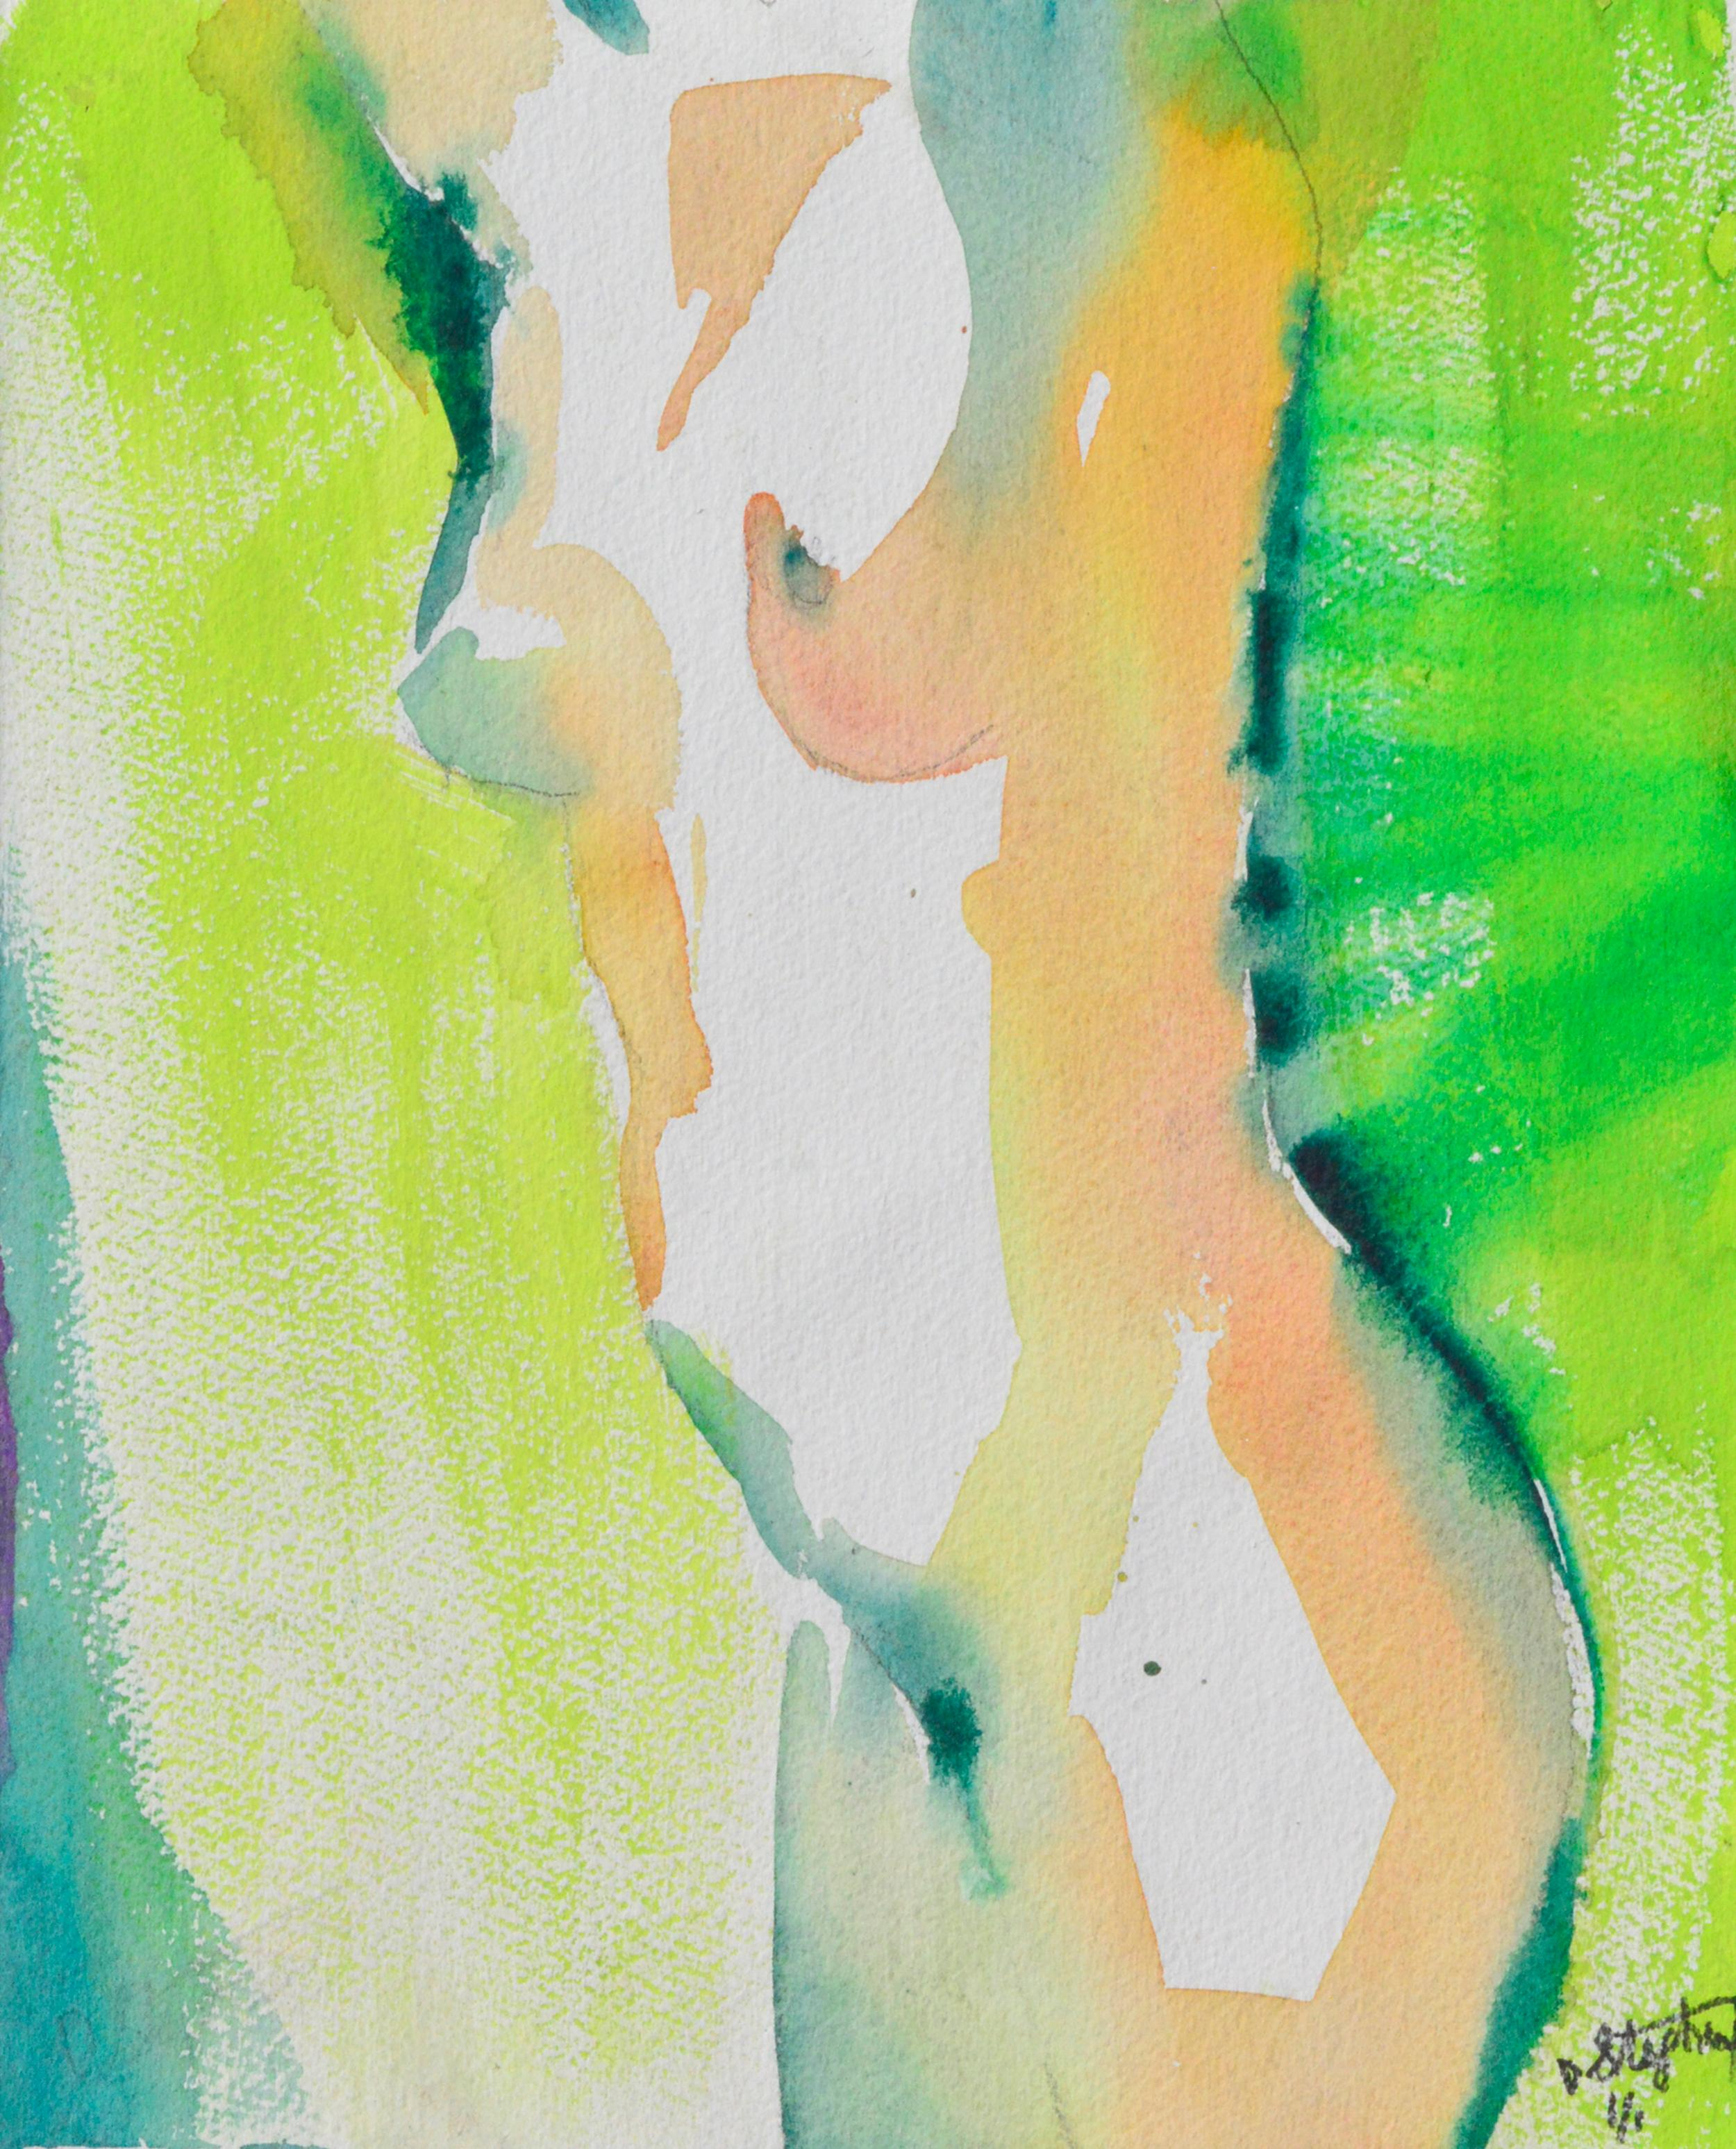 Green Nude Woman's Torso